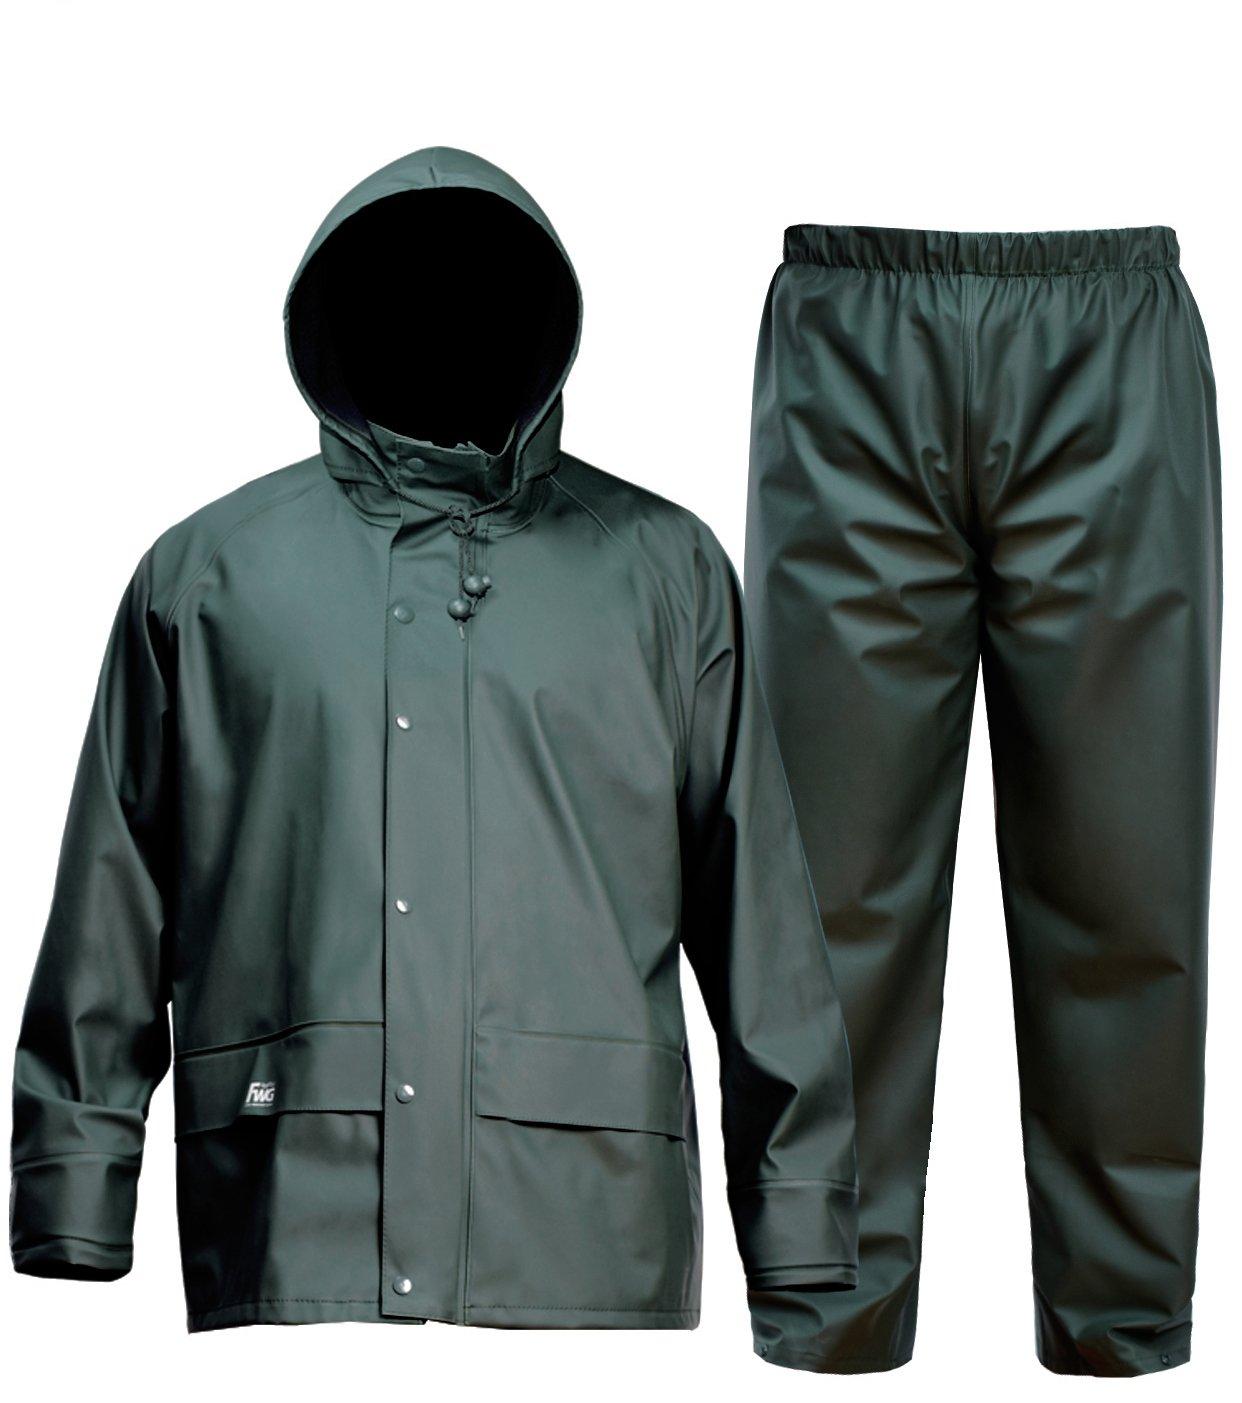 Navis Marine FWG Men's Rain Suit Commercial Fishing Heavy Duty Workwear Waterproof Jacket with Pants 3 Pieces (XXL)